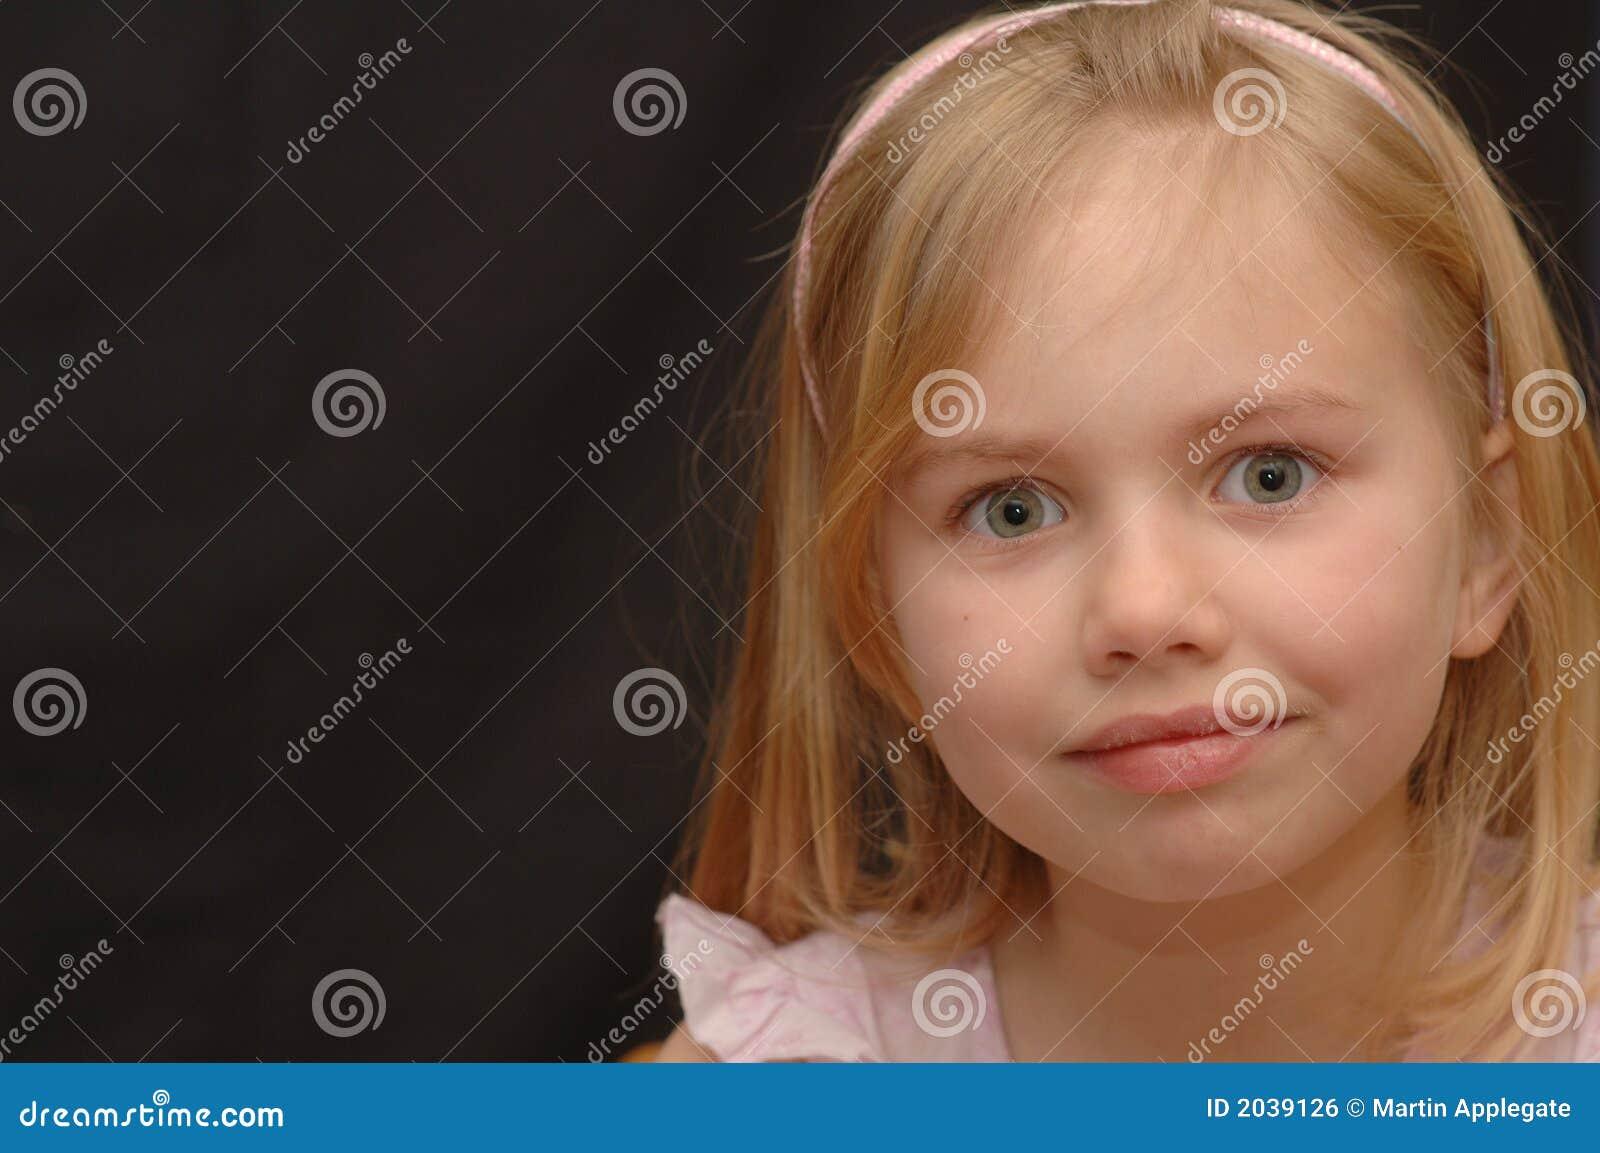 Menina de olhos bem abertos